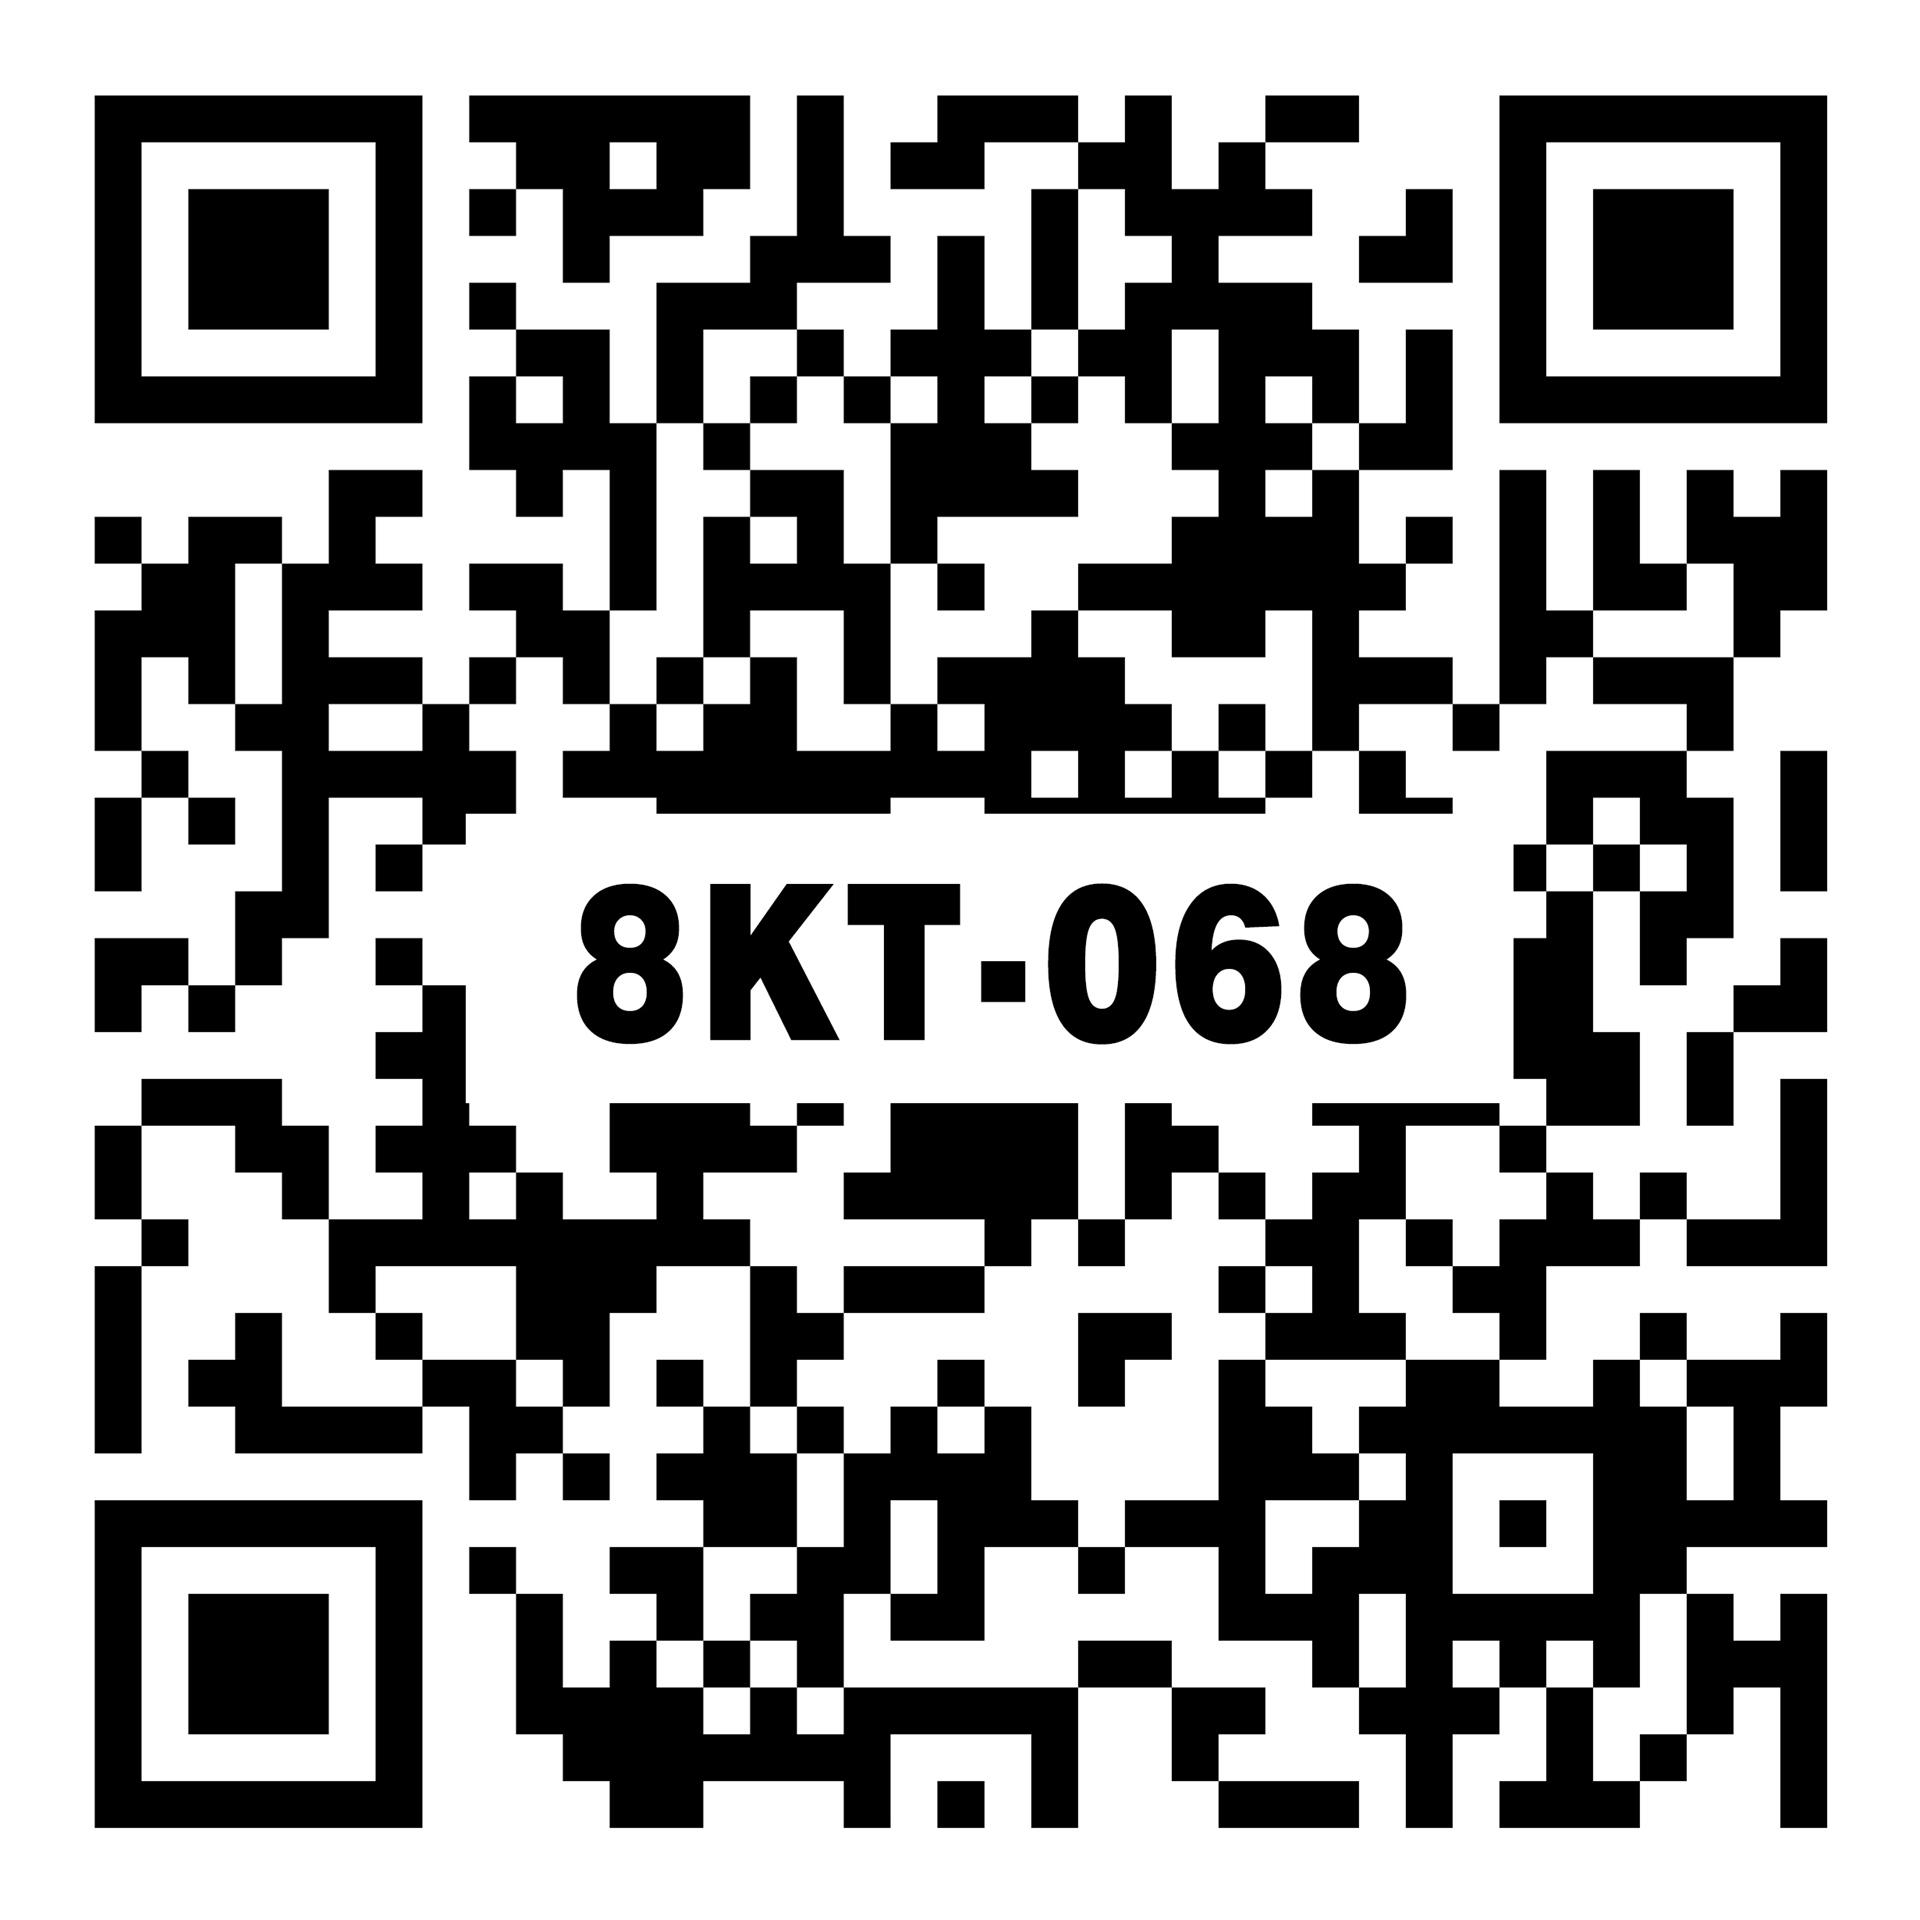 8KT-068